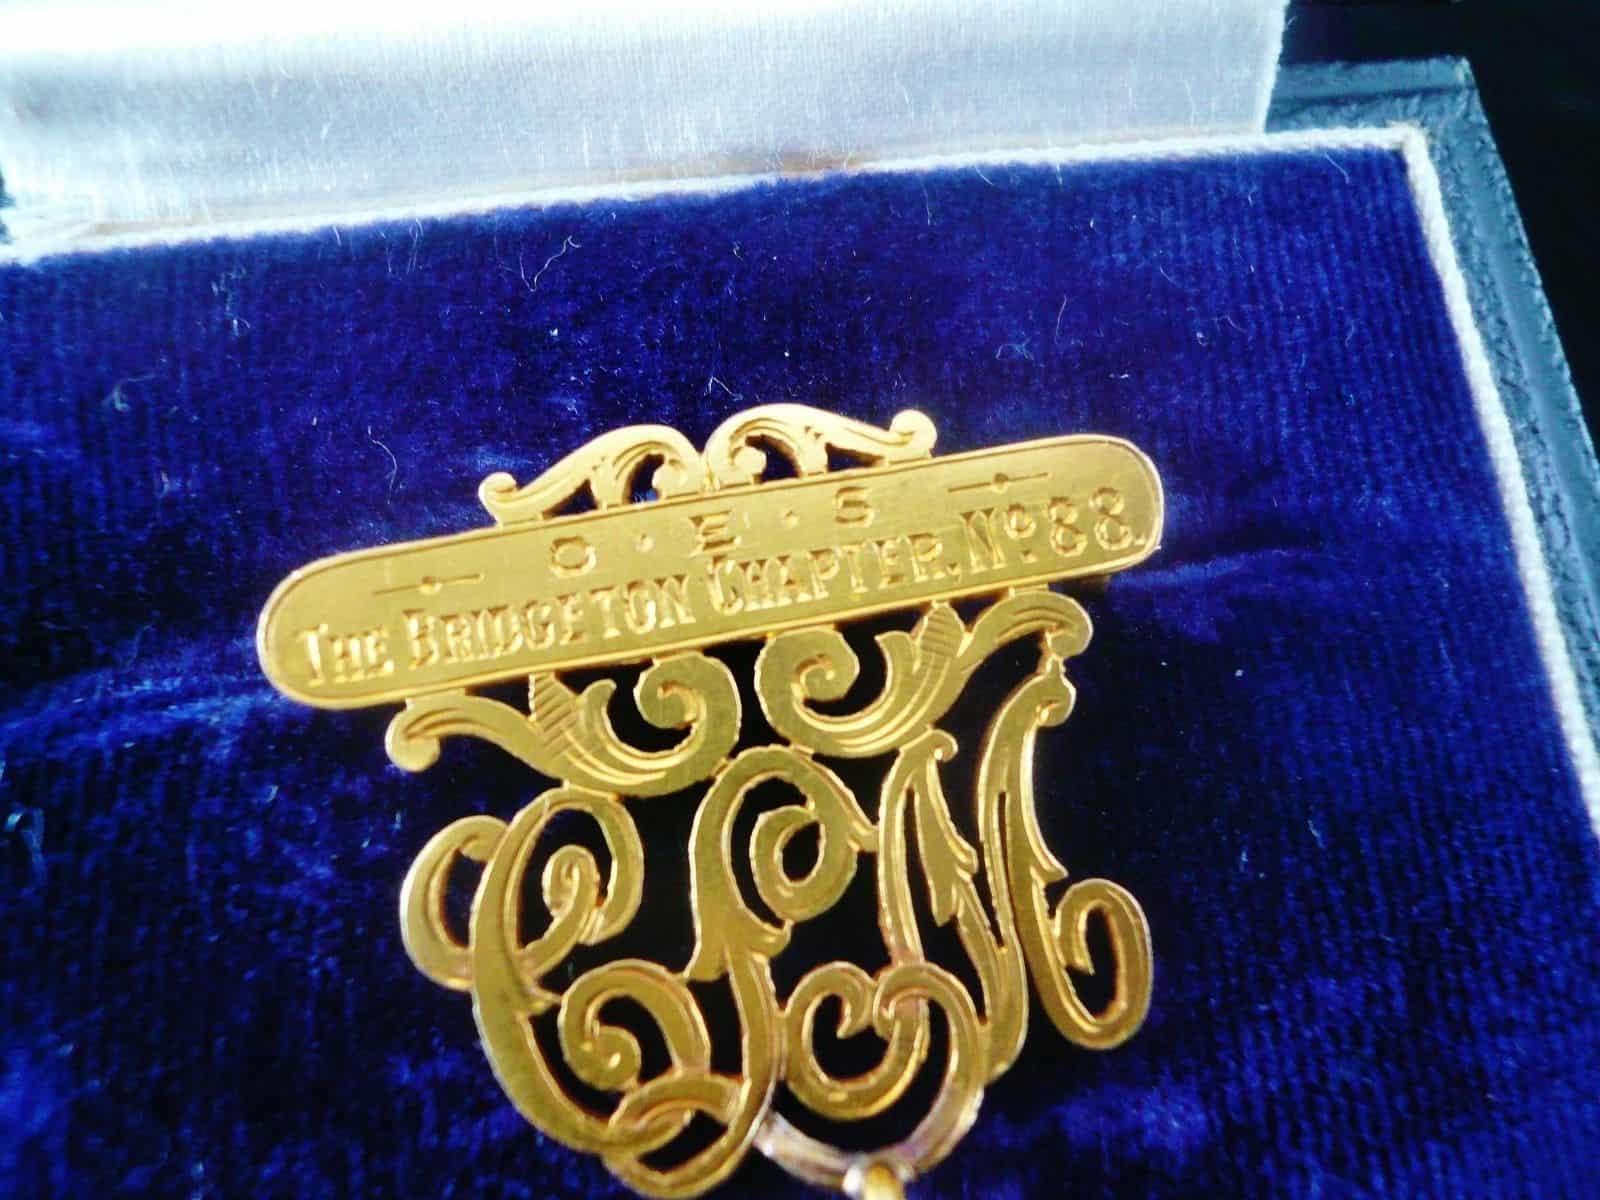 18ct Gold Masonic Order of the Eastern Star Breast Jewel, (cased) Bridgeton  Chapter no88